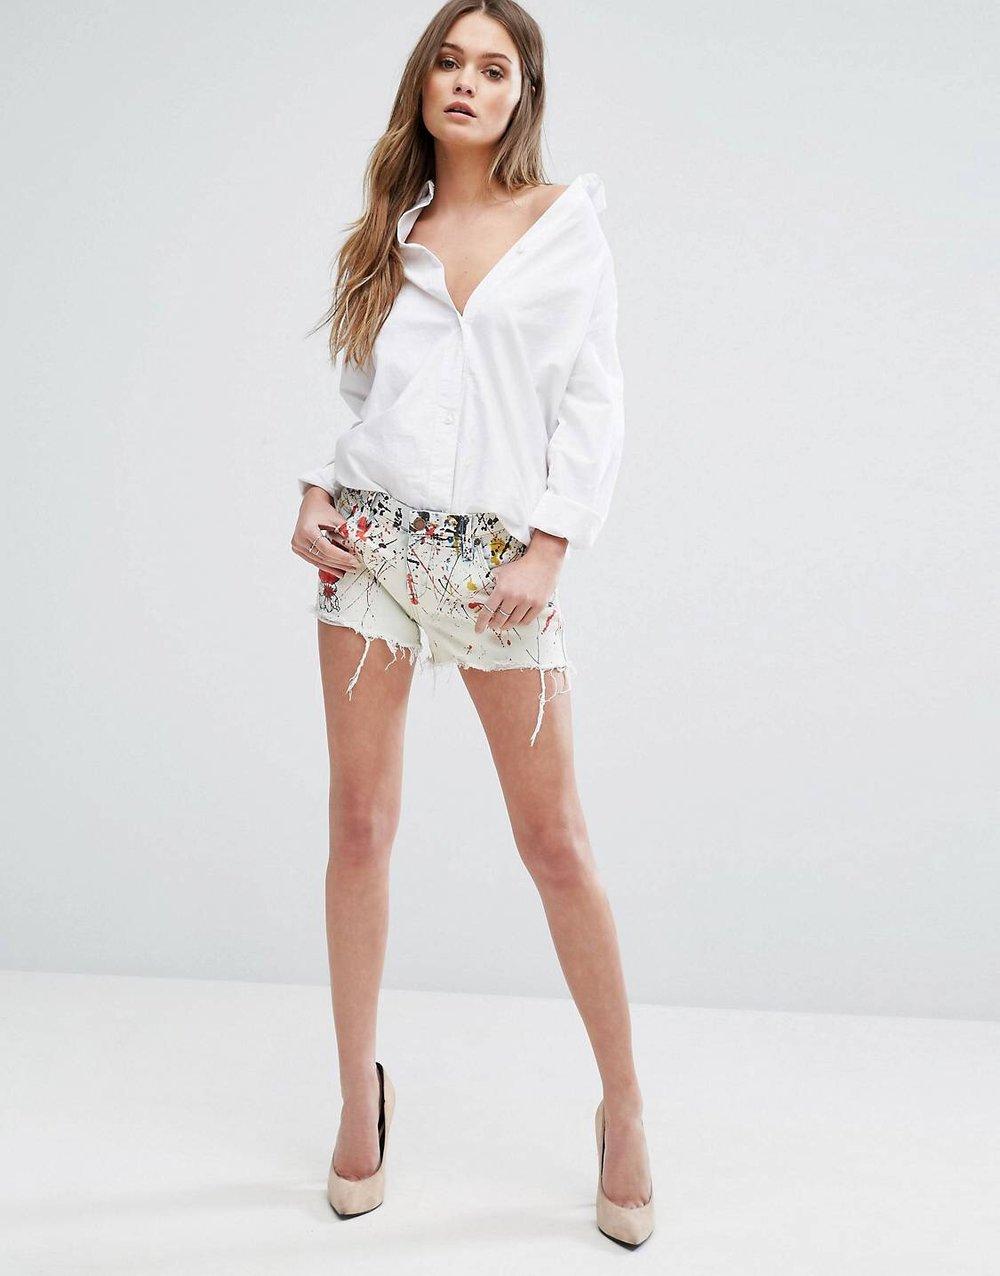 The Shirt (not shorts) -